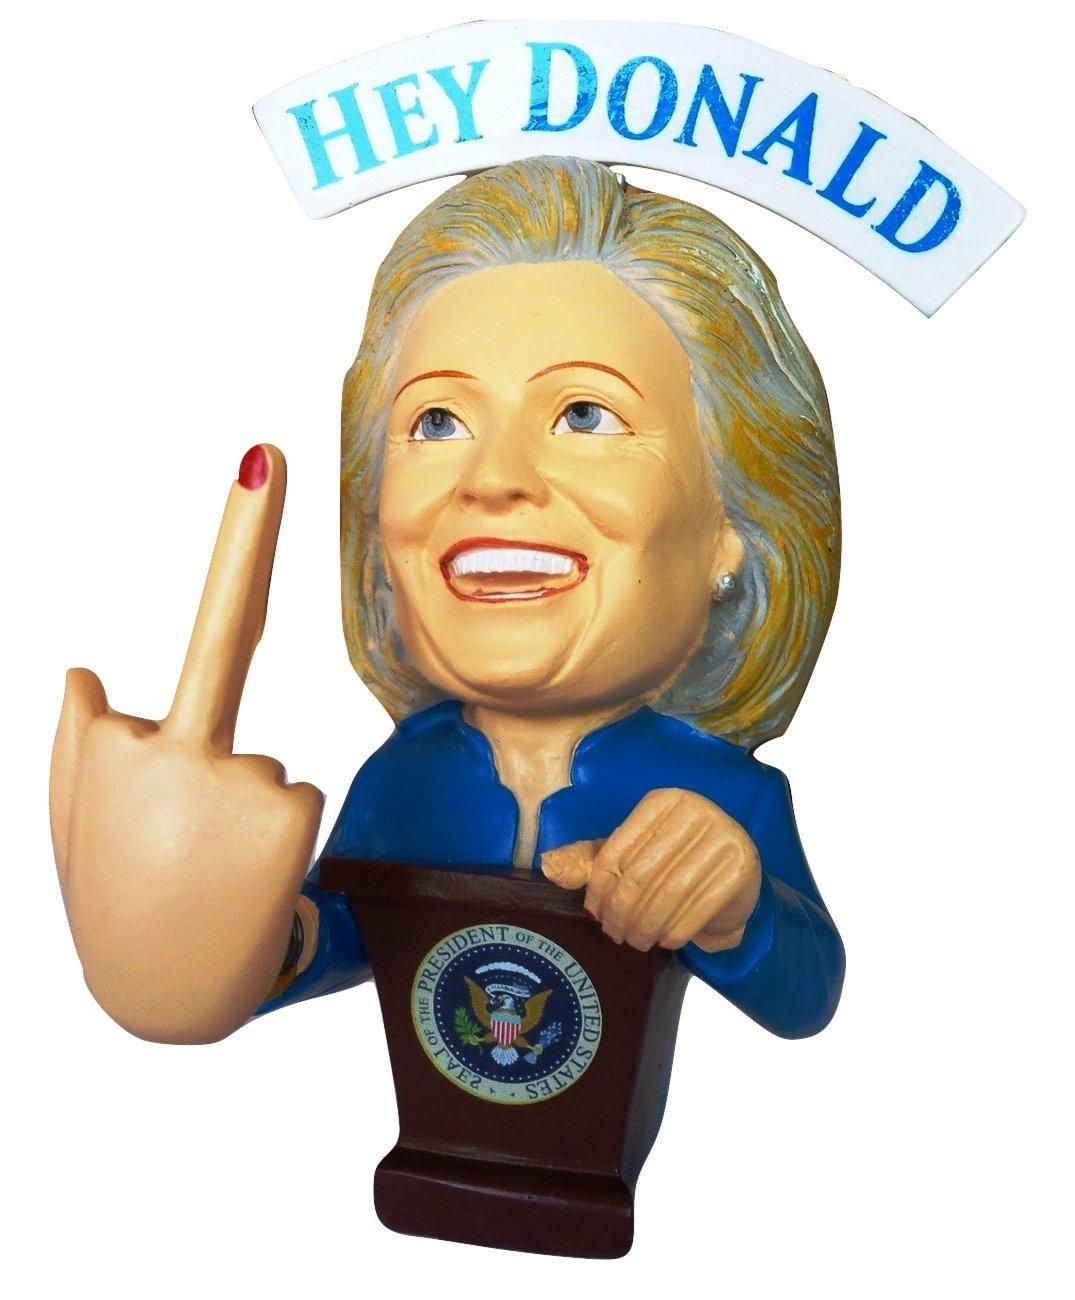 Hillary Clinton FU.. YOU Donald Trump Bobble Middle Finger Bobblehead - Election 2016 by FU Clinton Bobbles